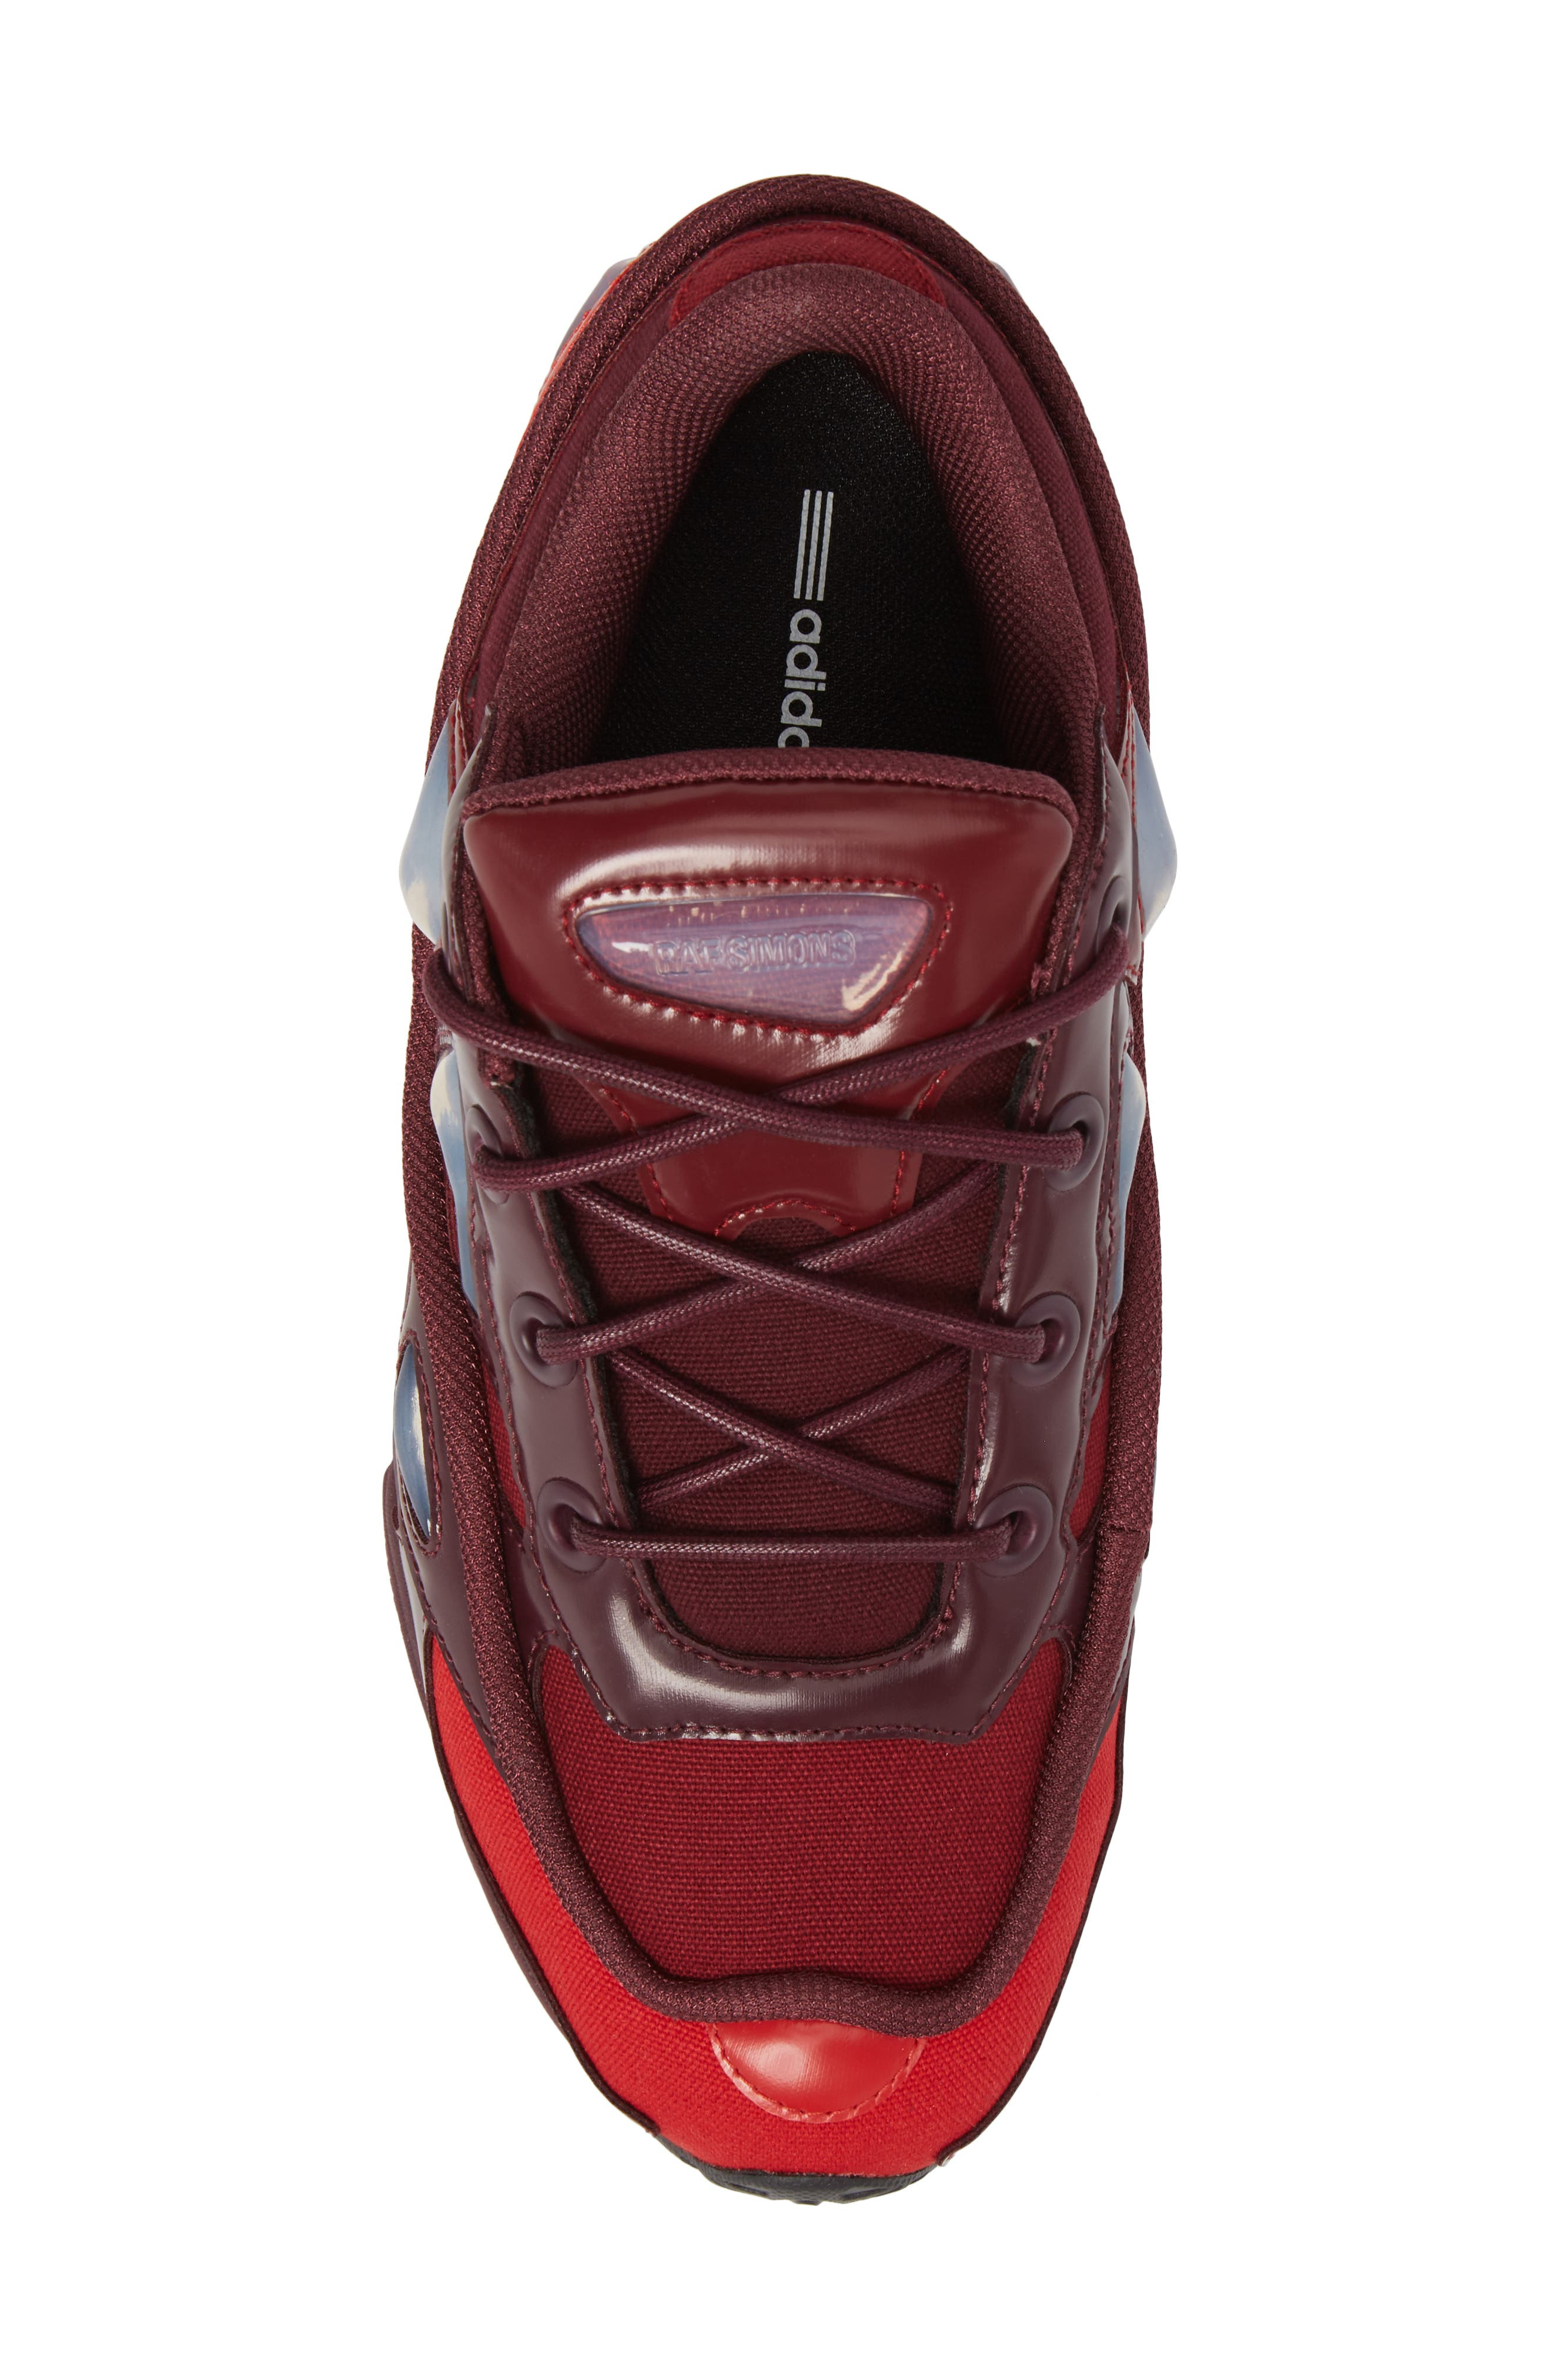 adidas by Raf Simons Ozweego III Sneaker,                             Alternate thumbnail 5, color,                             Burgundy/ Maroon/ Scarlet